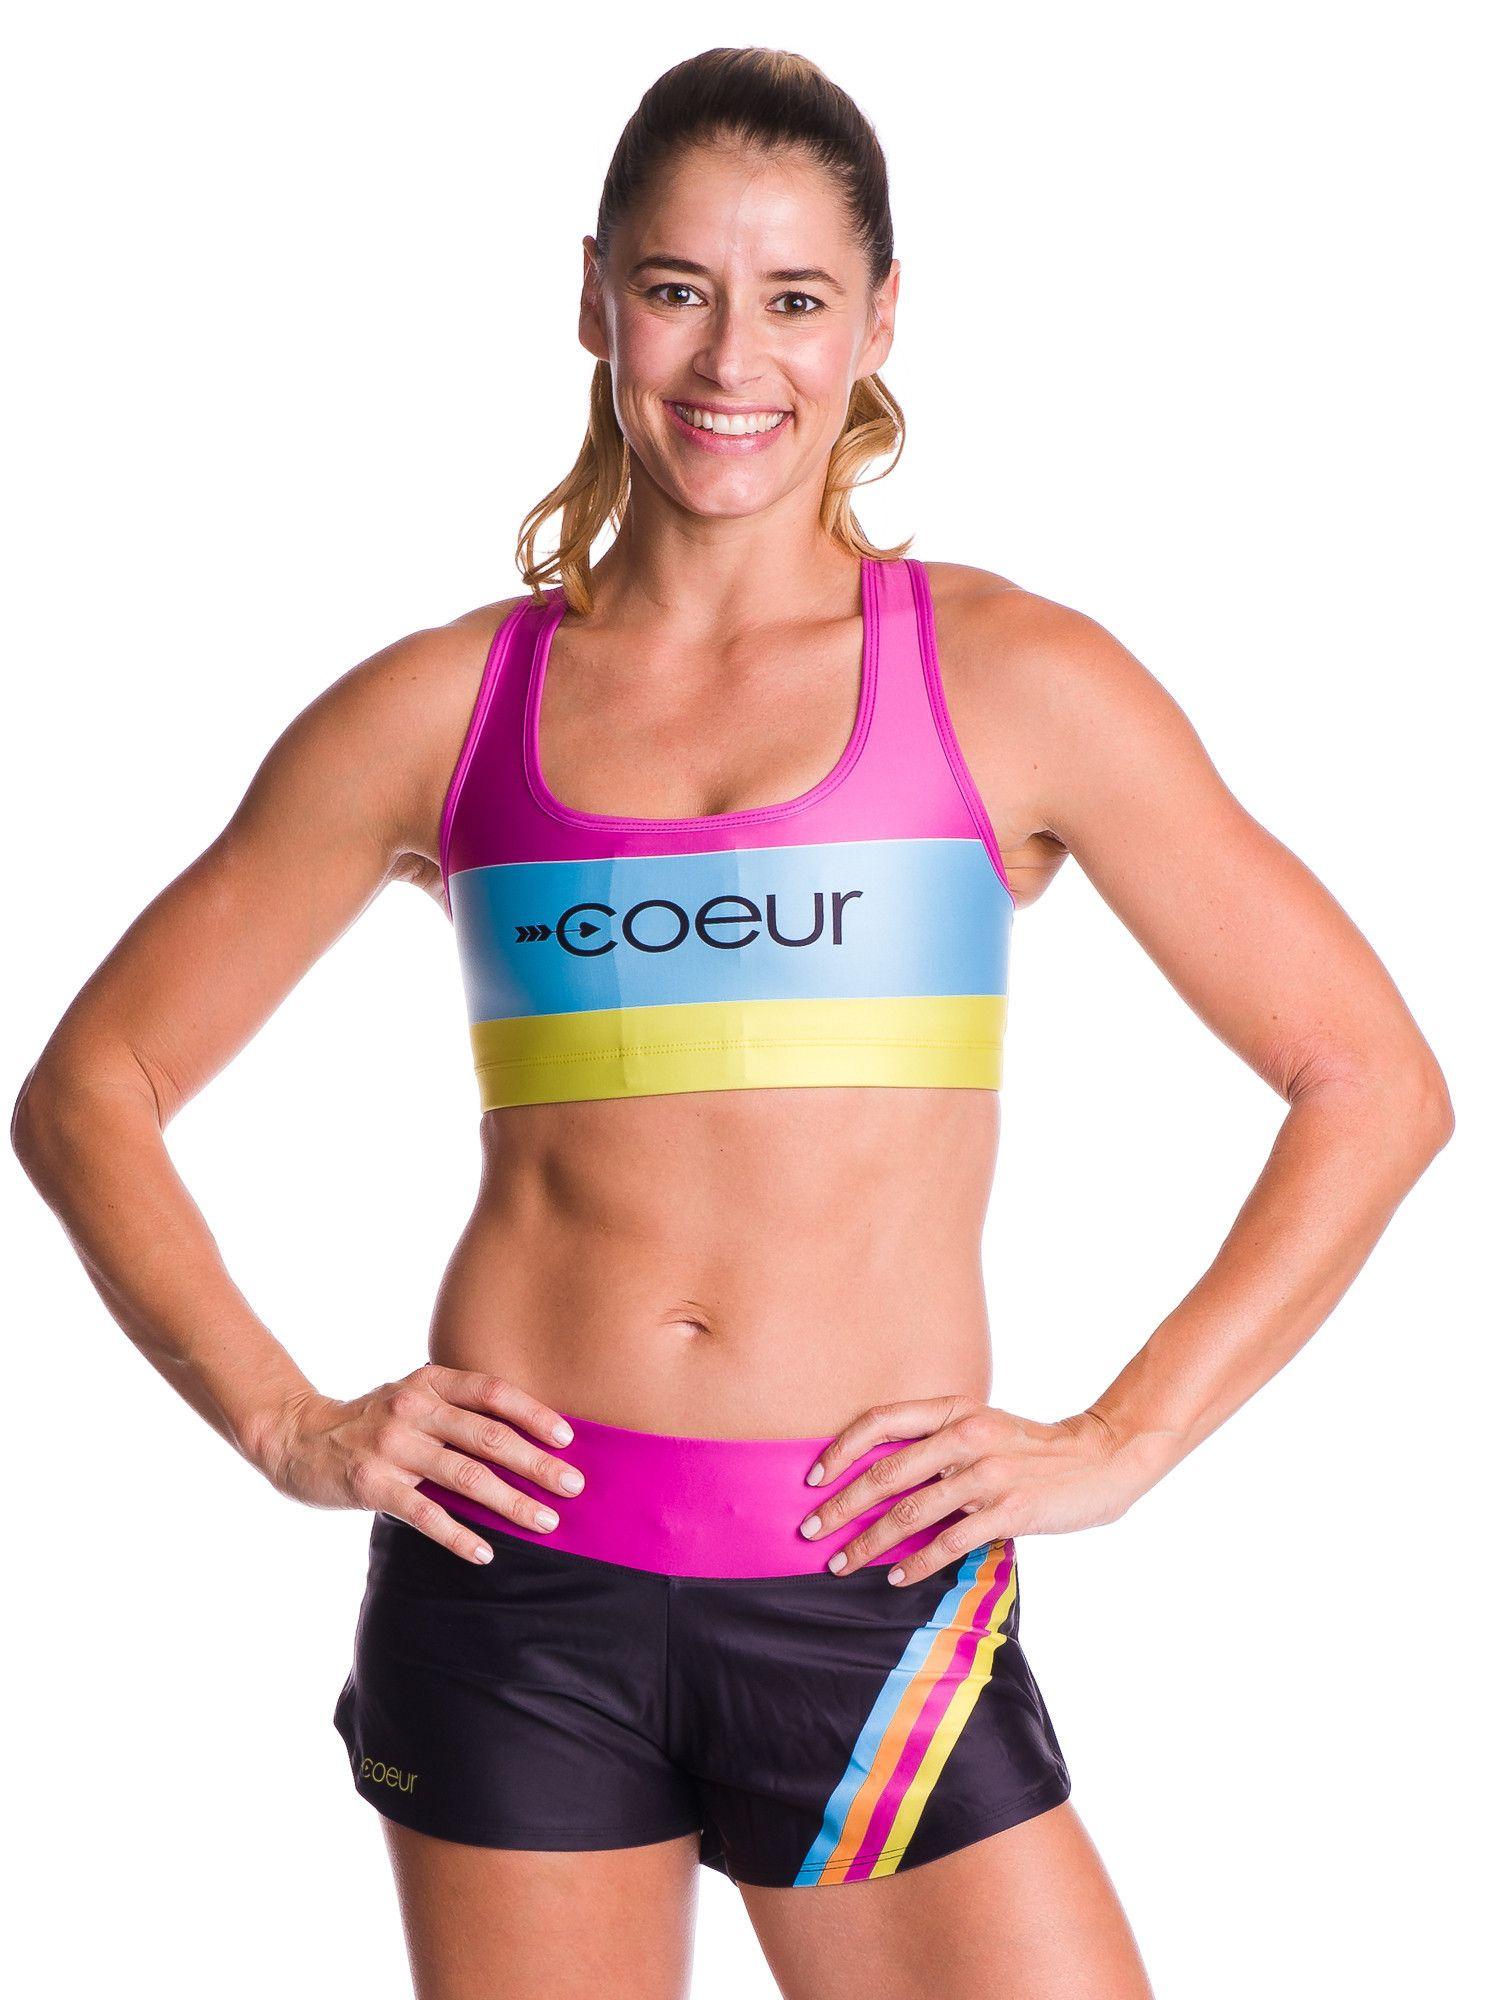 e6ec5378096 Women s Running Shorts in Island Vibe Design